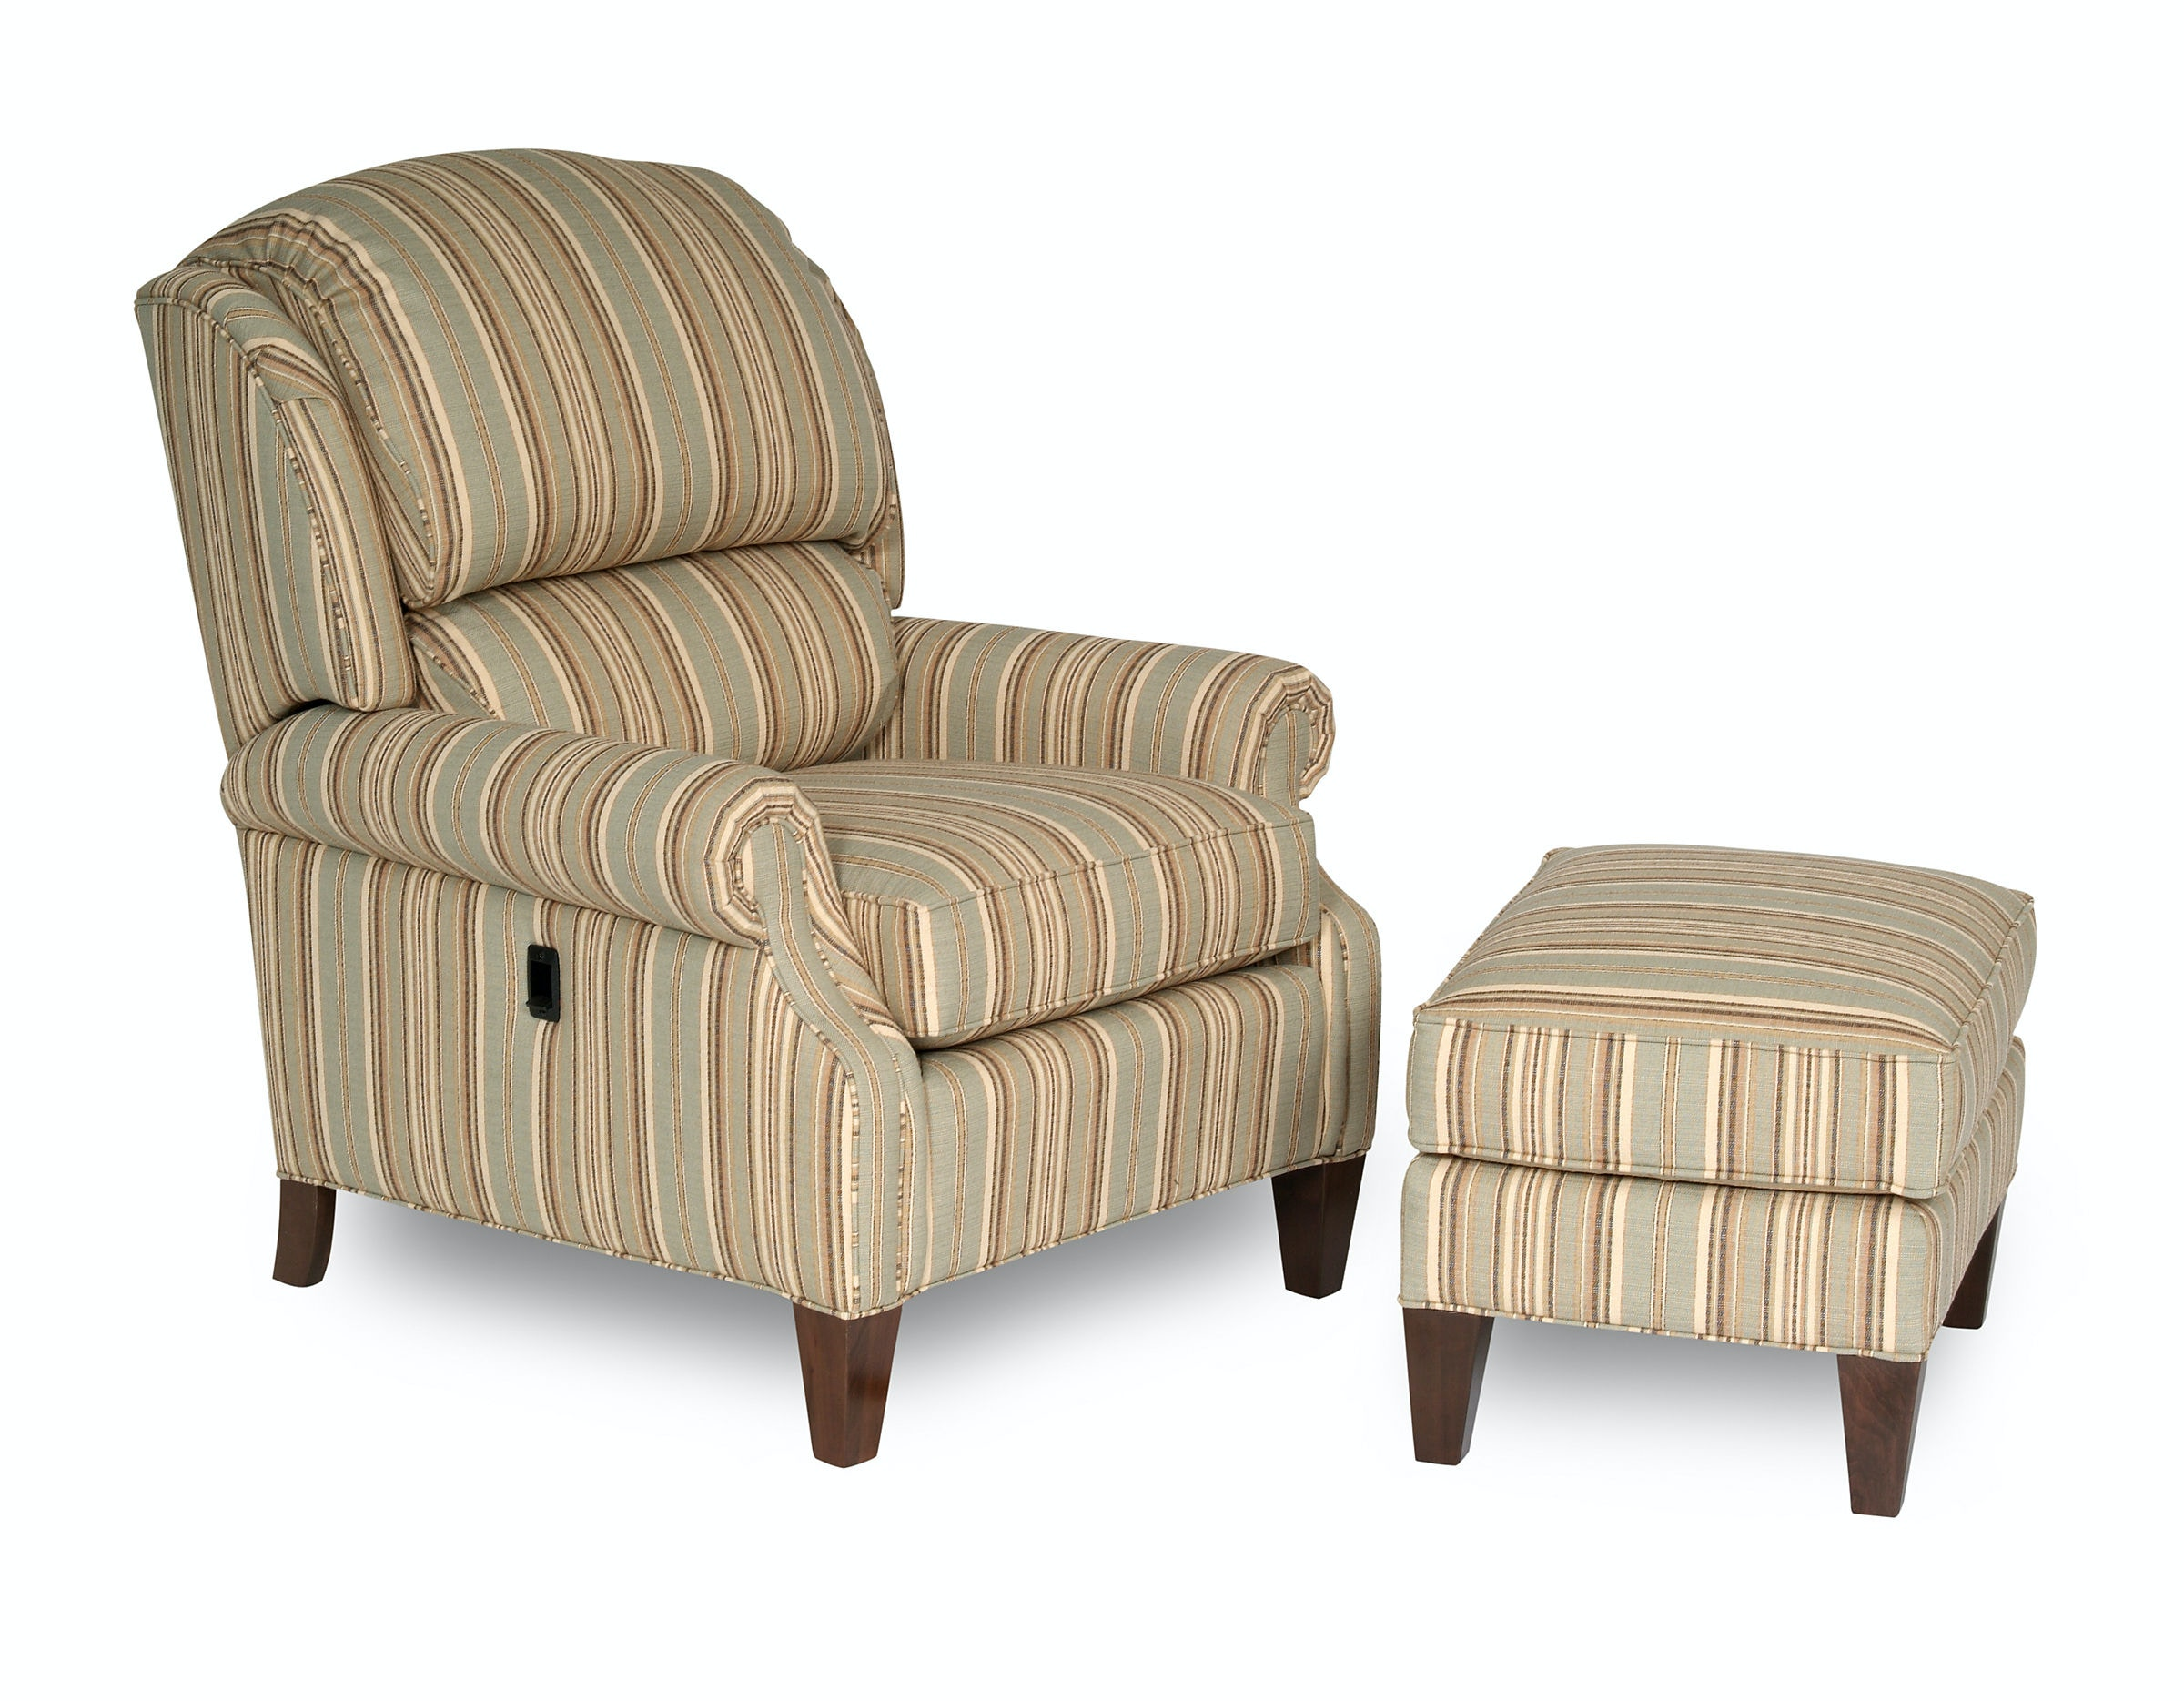 Genial Smith Brothers Tilt Back Chair 951 47